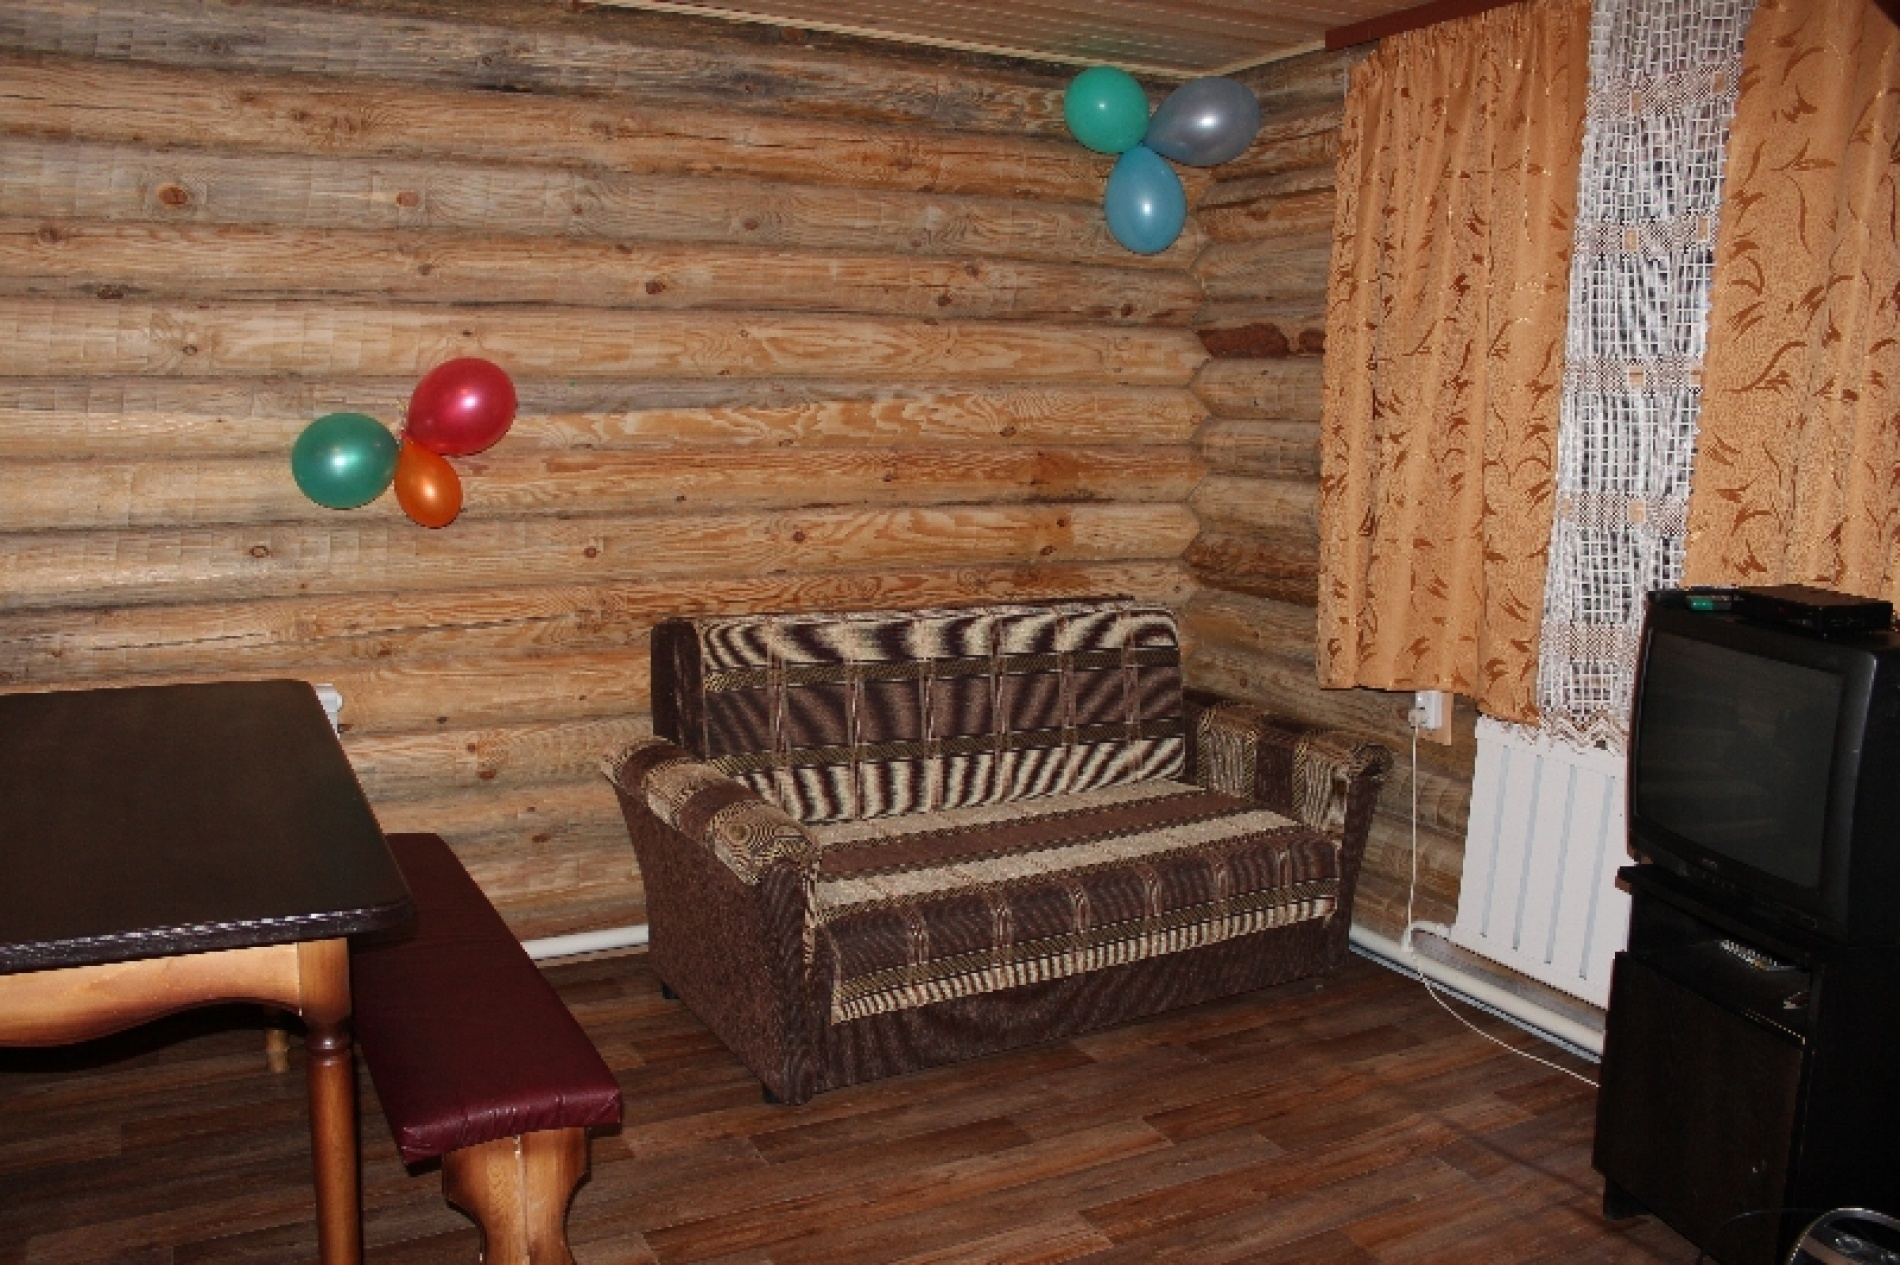 База отдыха «Раухова мельница» Красноярский край Коттедж двухэтажный «Люкс», фото 12